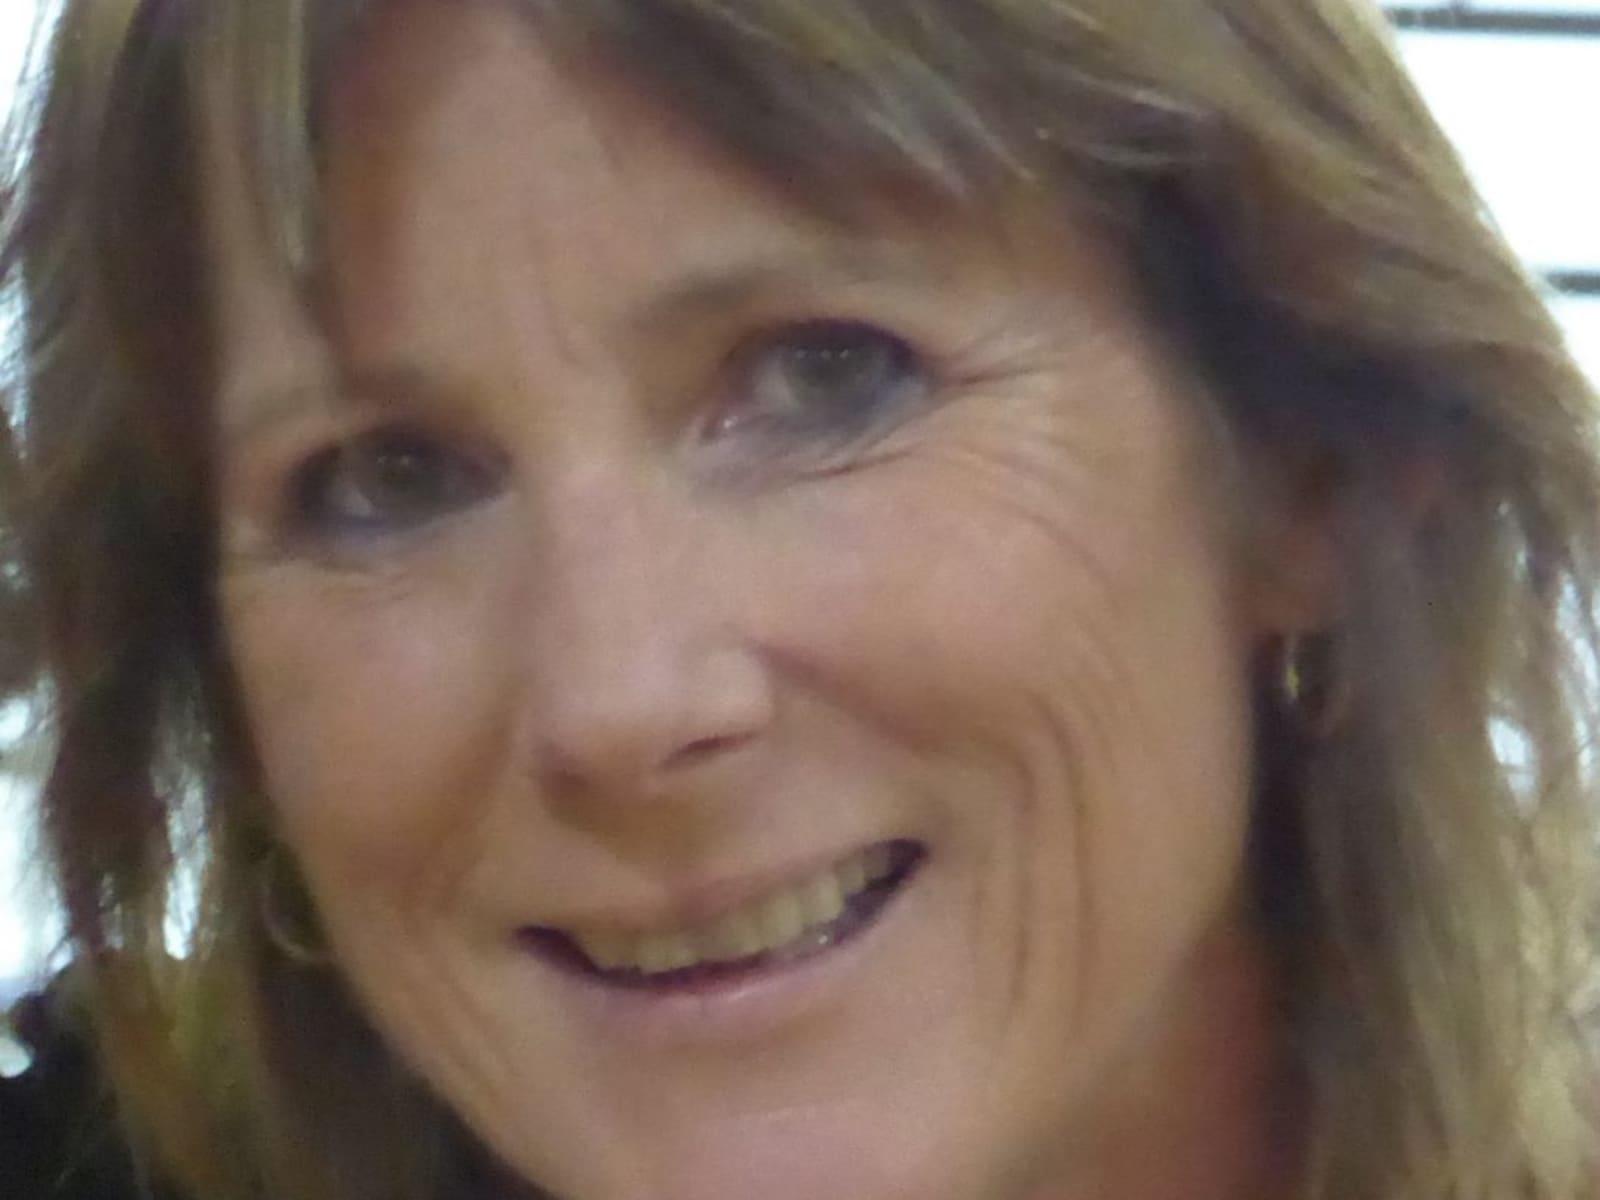 Debbie from Melbourne, Victoria, Australia